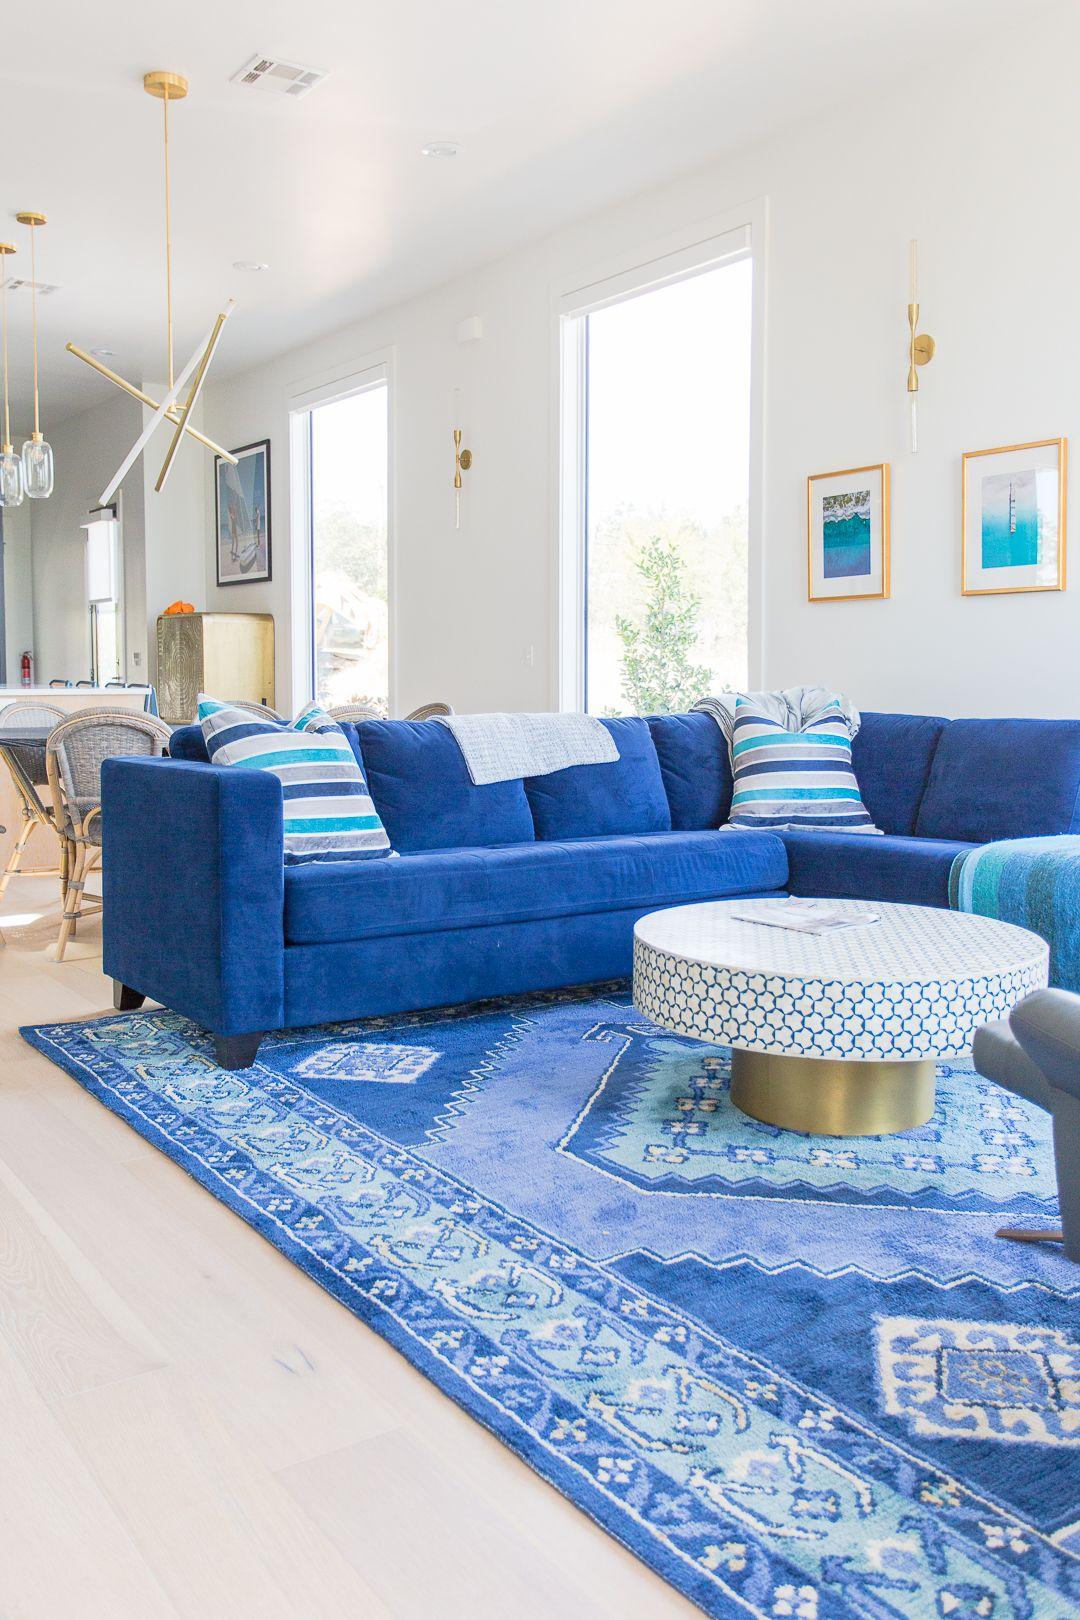 reveal modern boho lake house modern boho interior house on interior colors for lake house id=90017